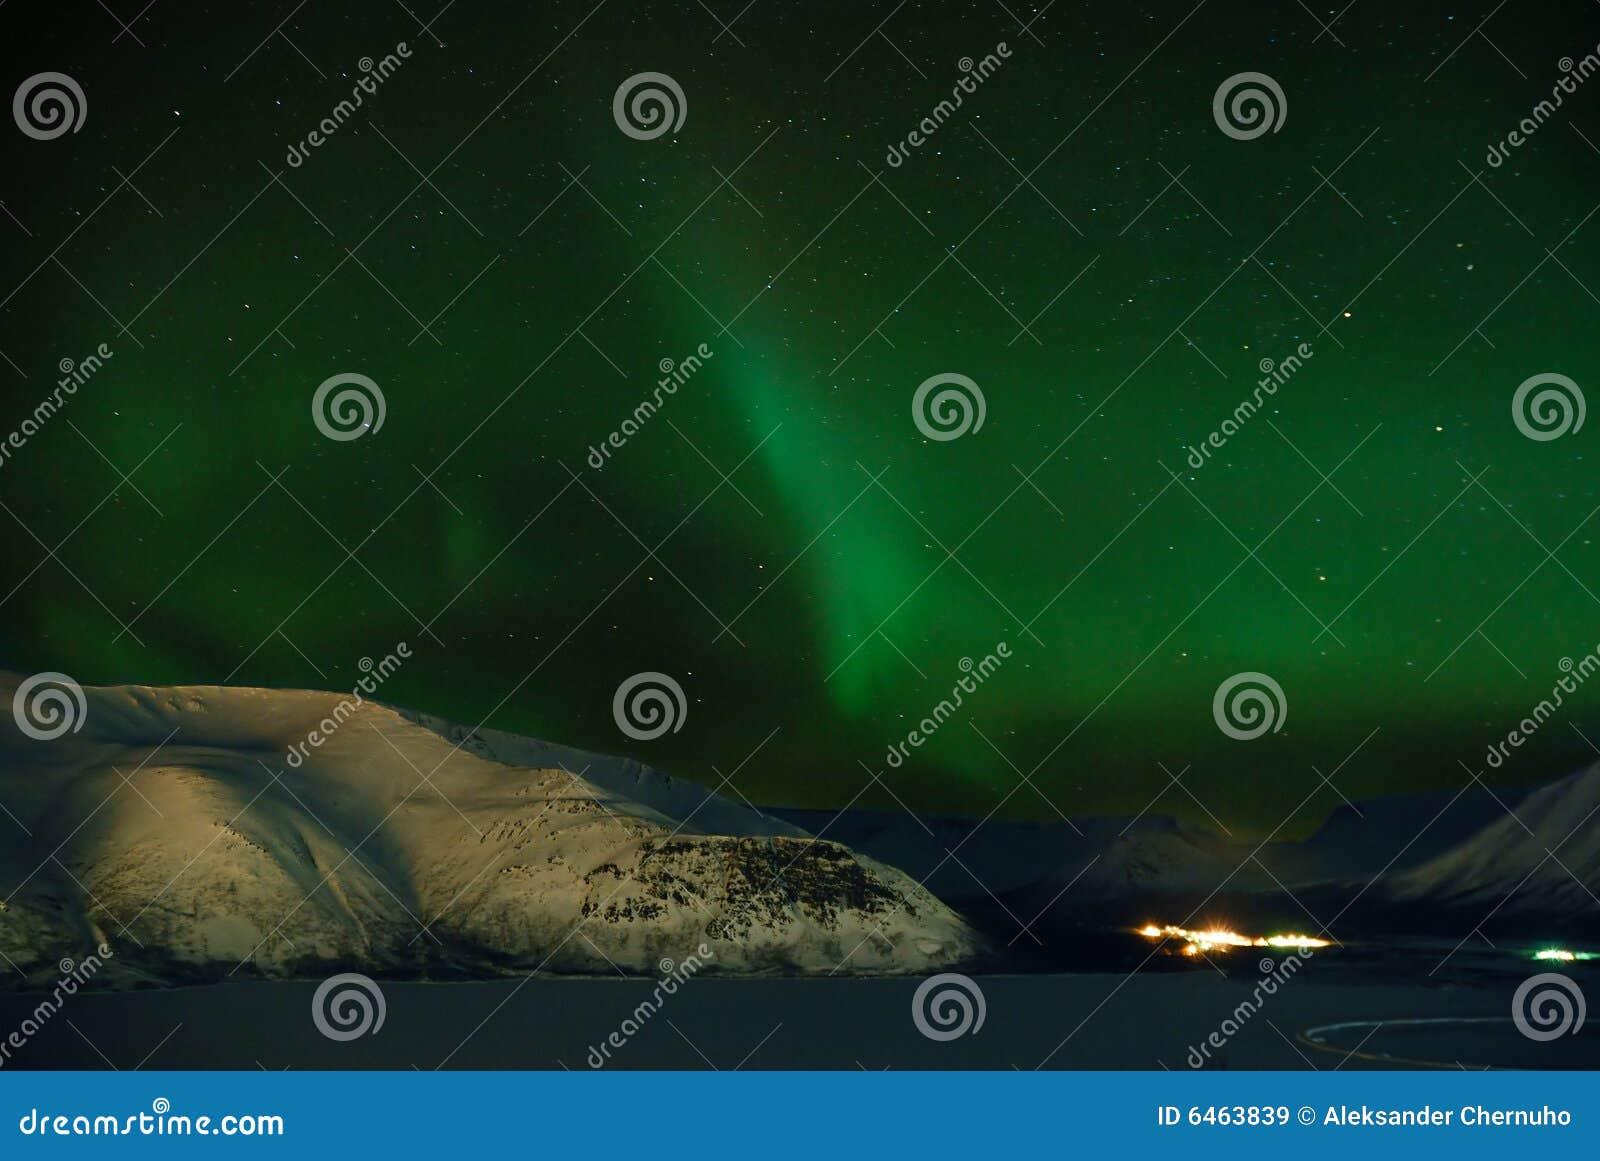 1 aurory borealis